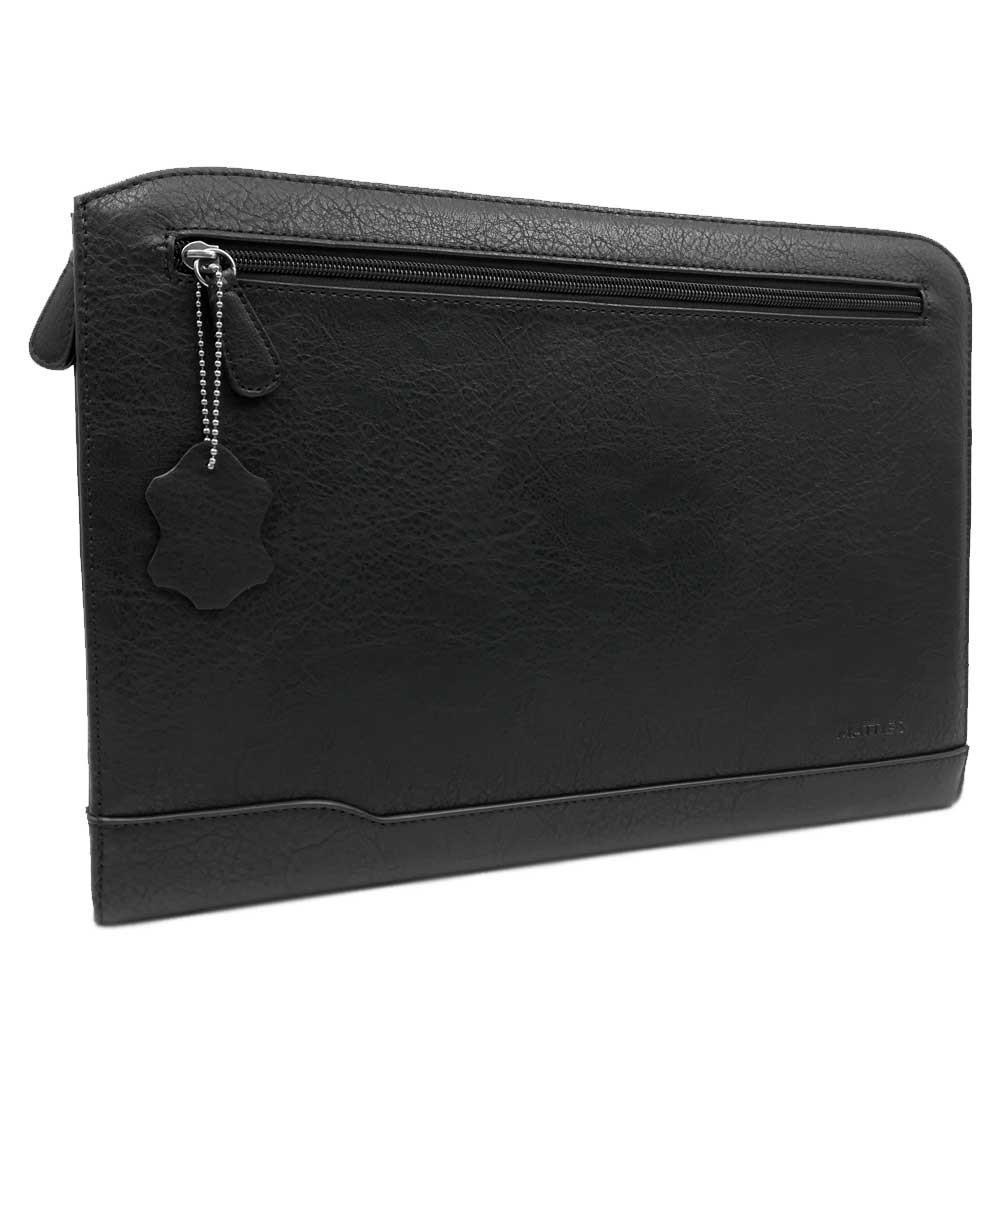 Matties Bags Portadocumentos Negro (Foto )